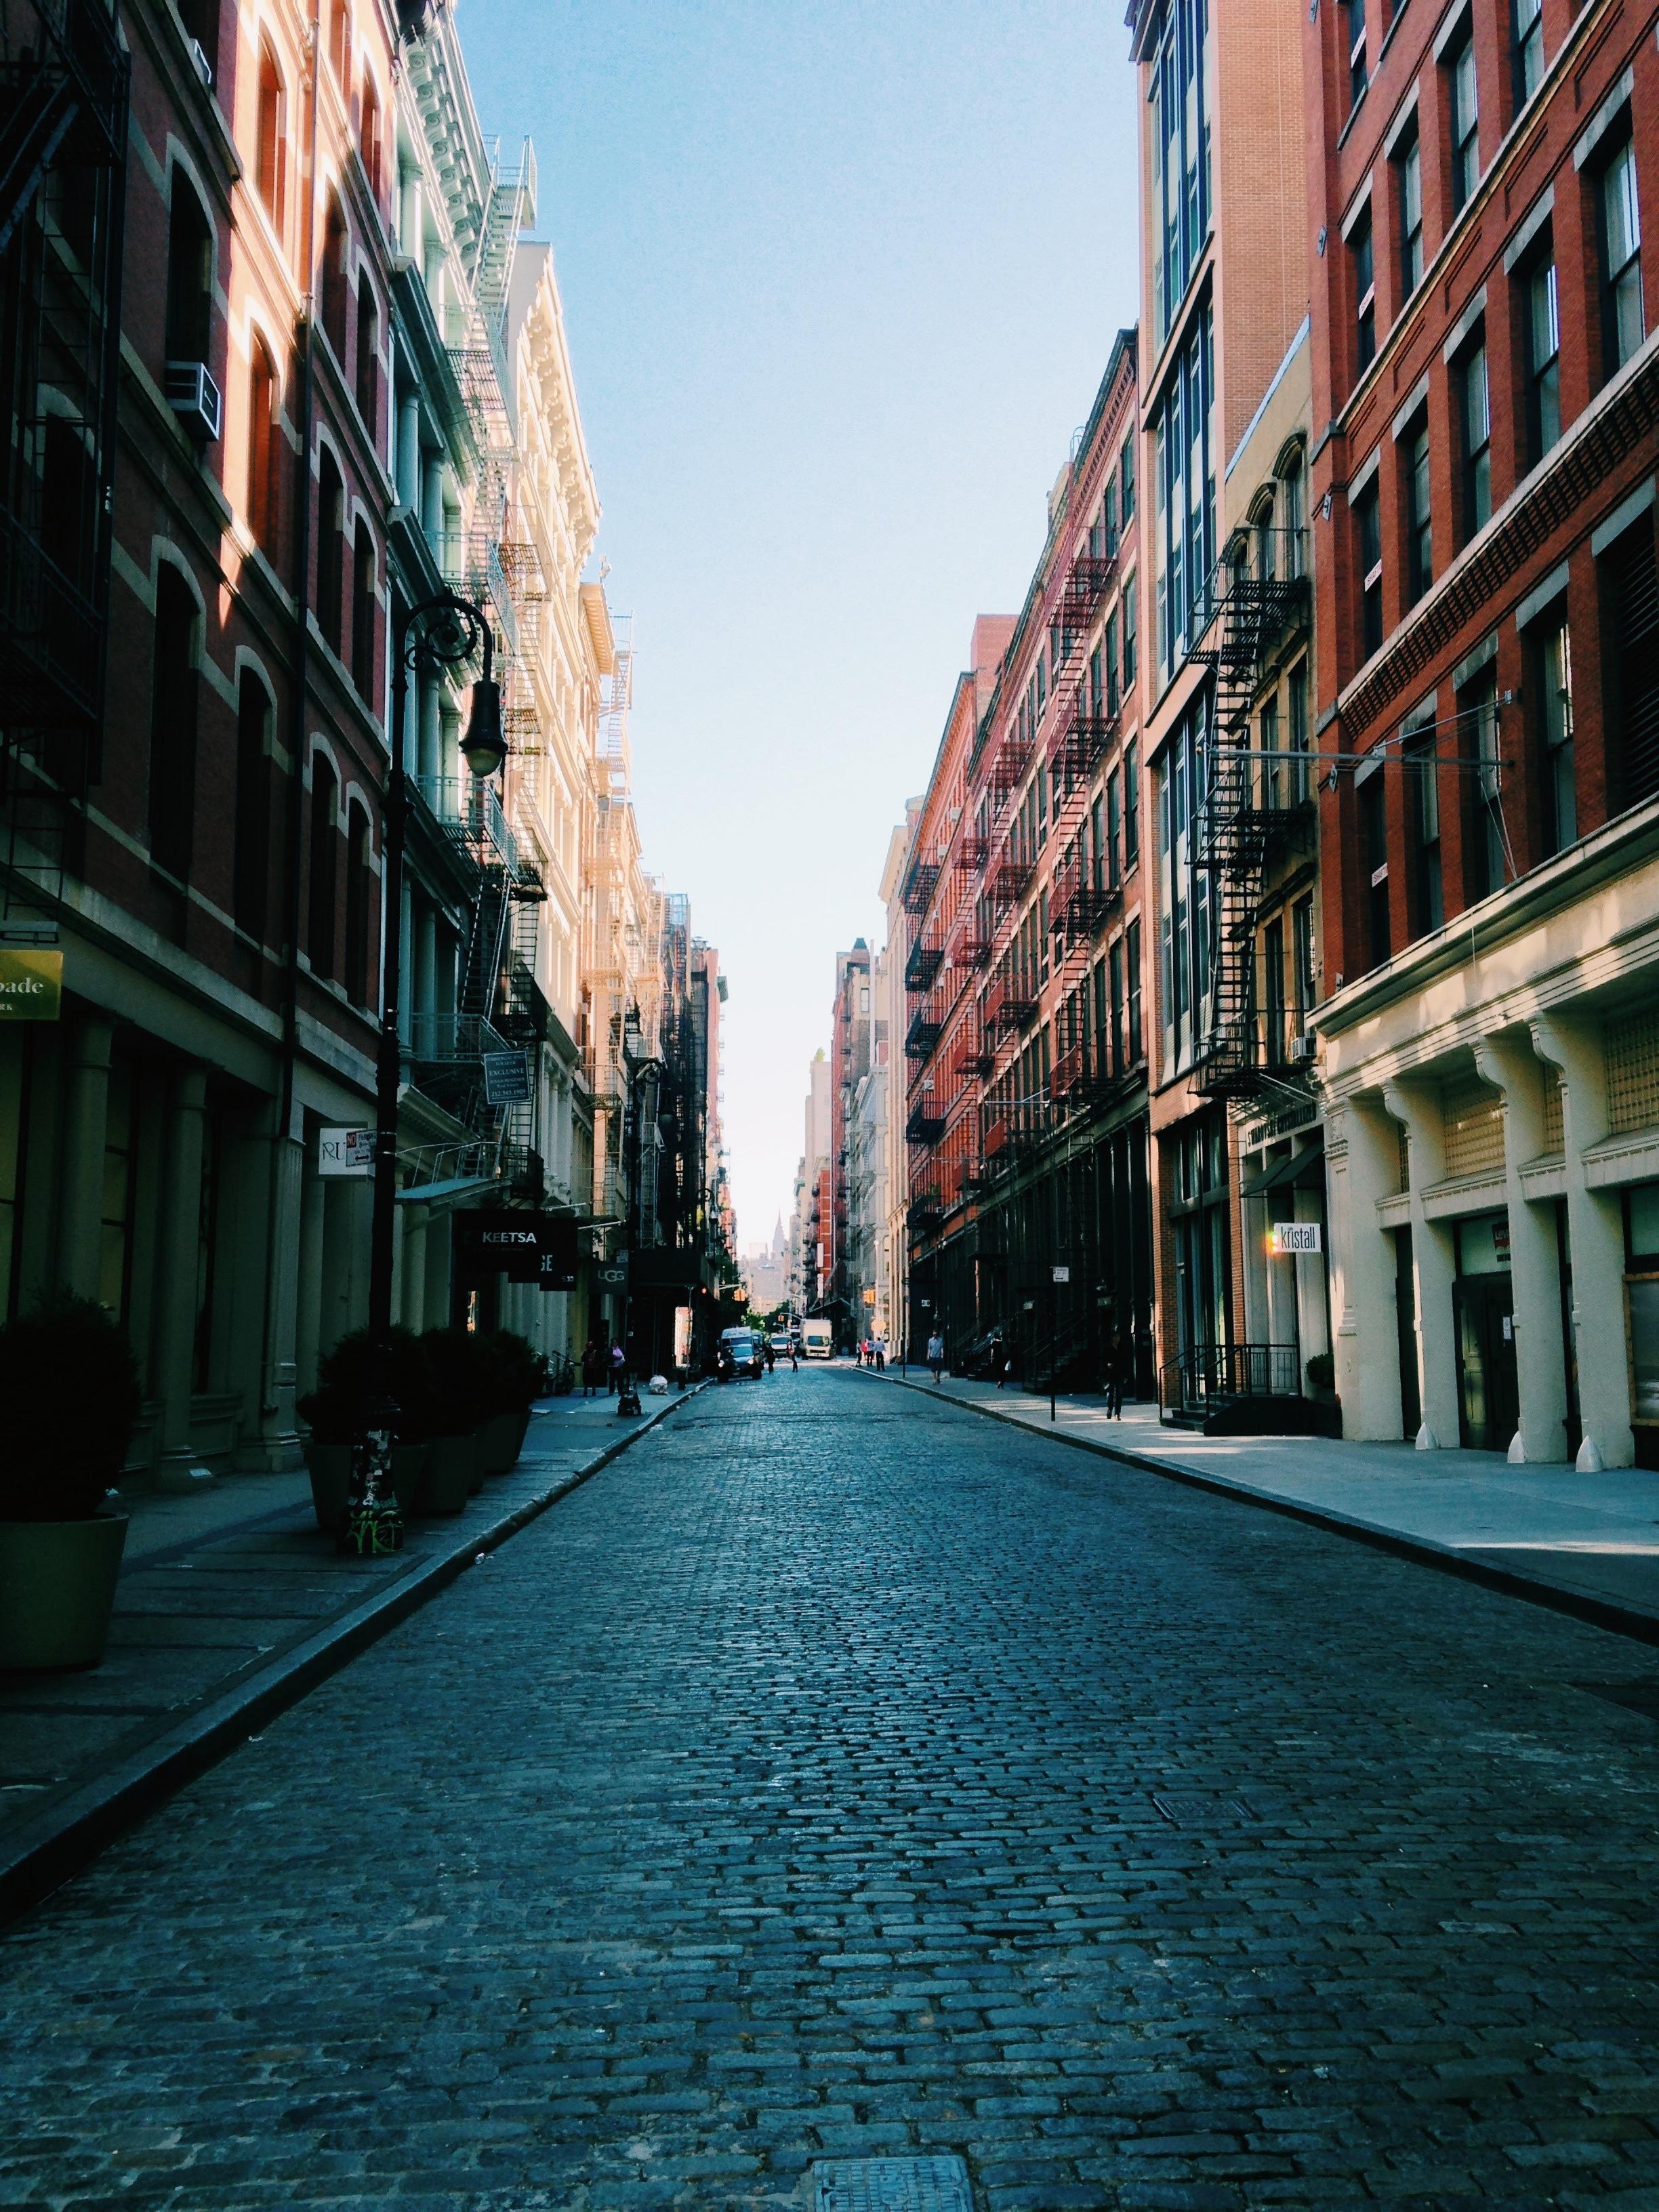 File:City-road-street-buildings (23698698644).jpg - Wikimedia Commons